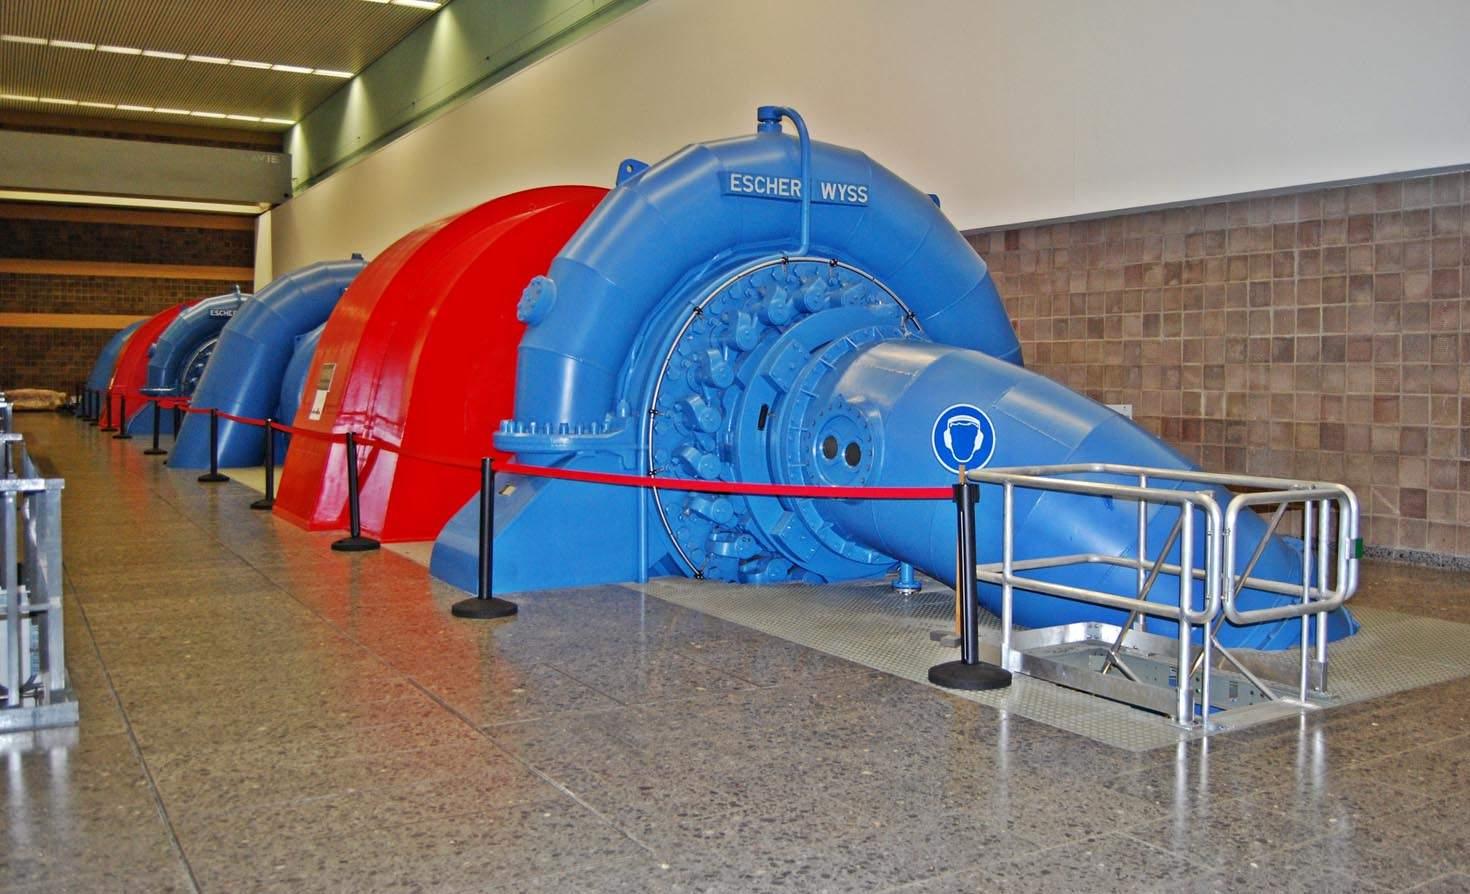 The turbine and pump hall of pumped storage hydro power station Glems near Metzingen, Baden-Württemberg.